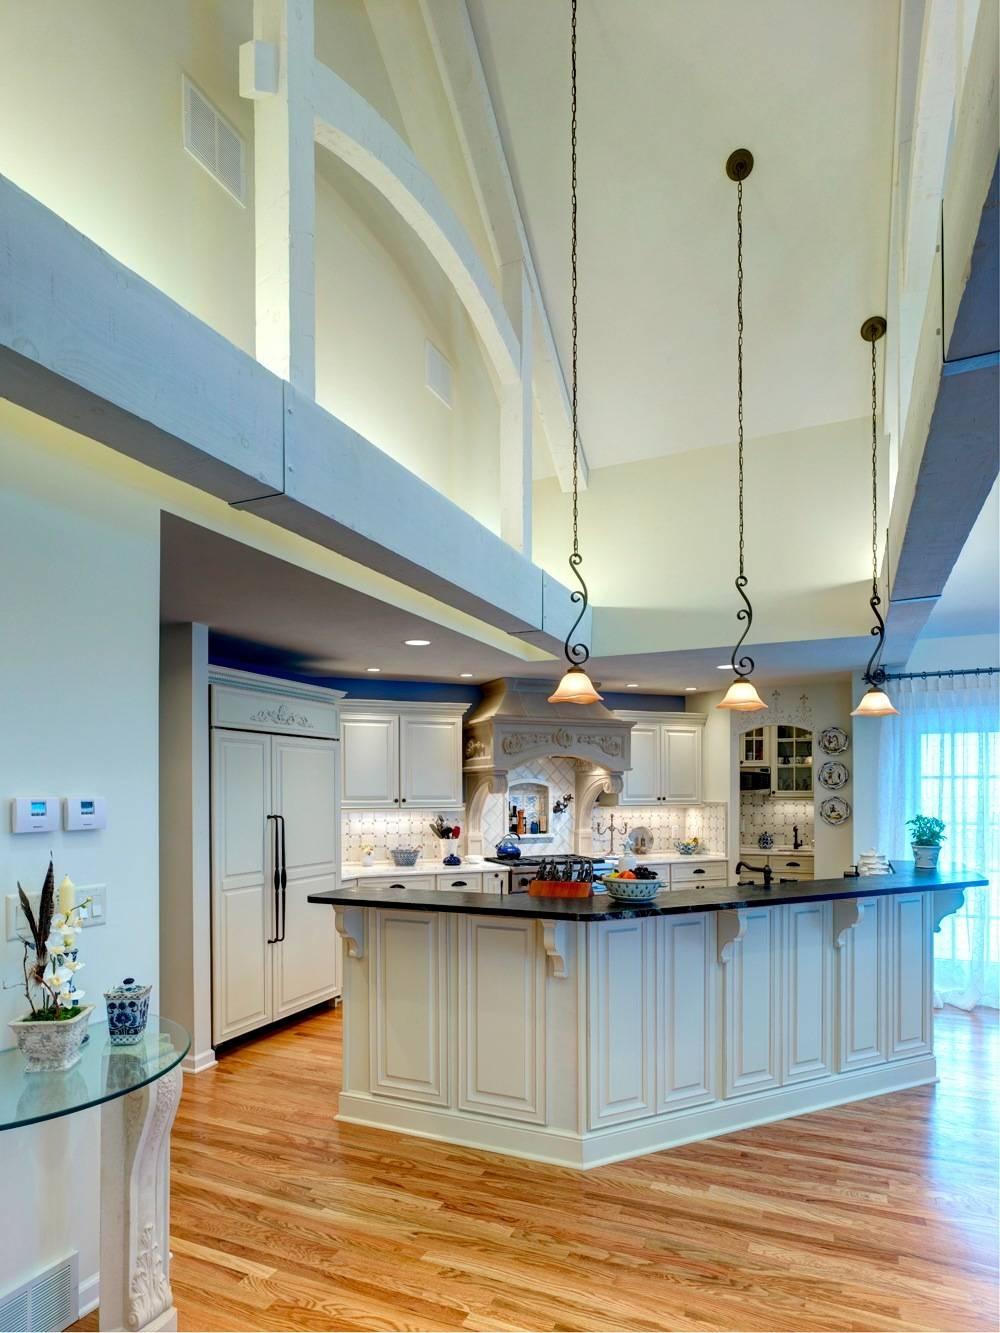 Kitchen Lighting Vaulted Ceiling - Kutsko Kitchen throughout Vaulted Ceiling Pendant Lighting (Image 10 of 15)